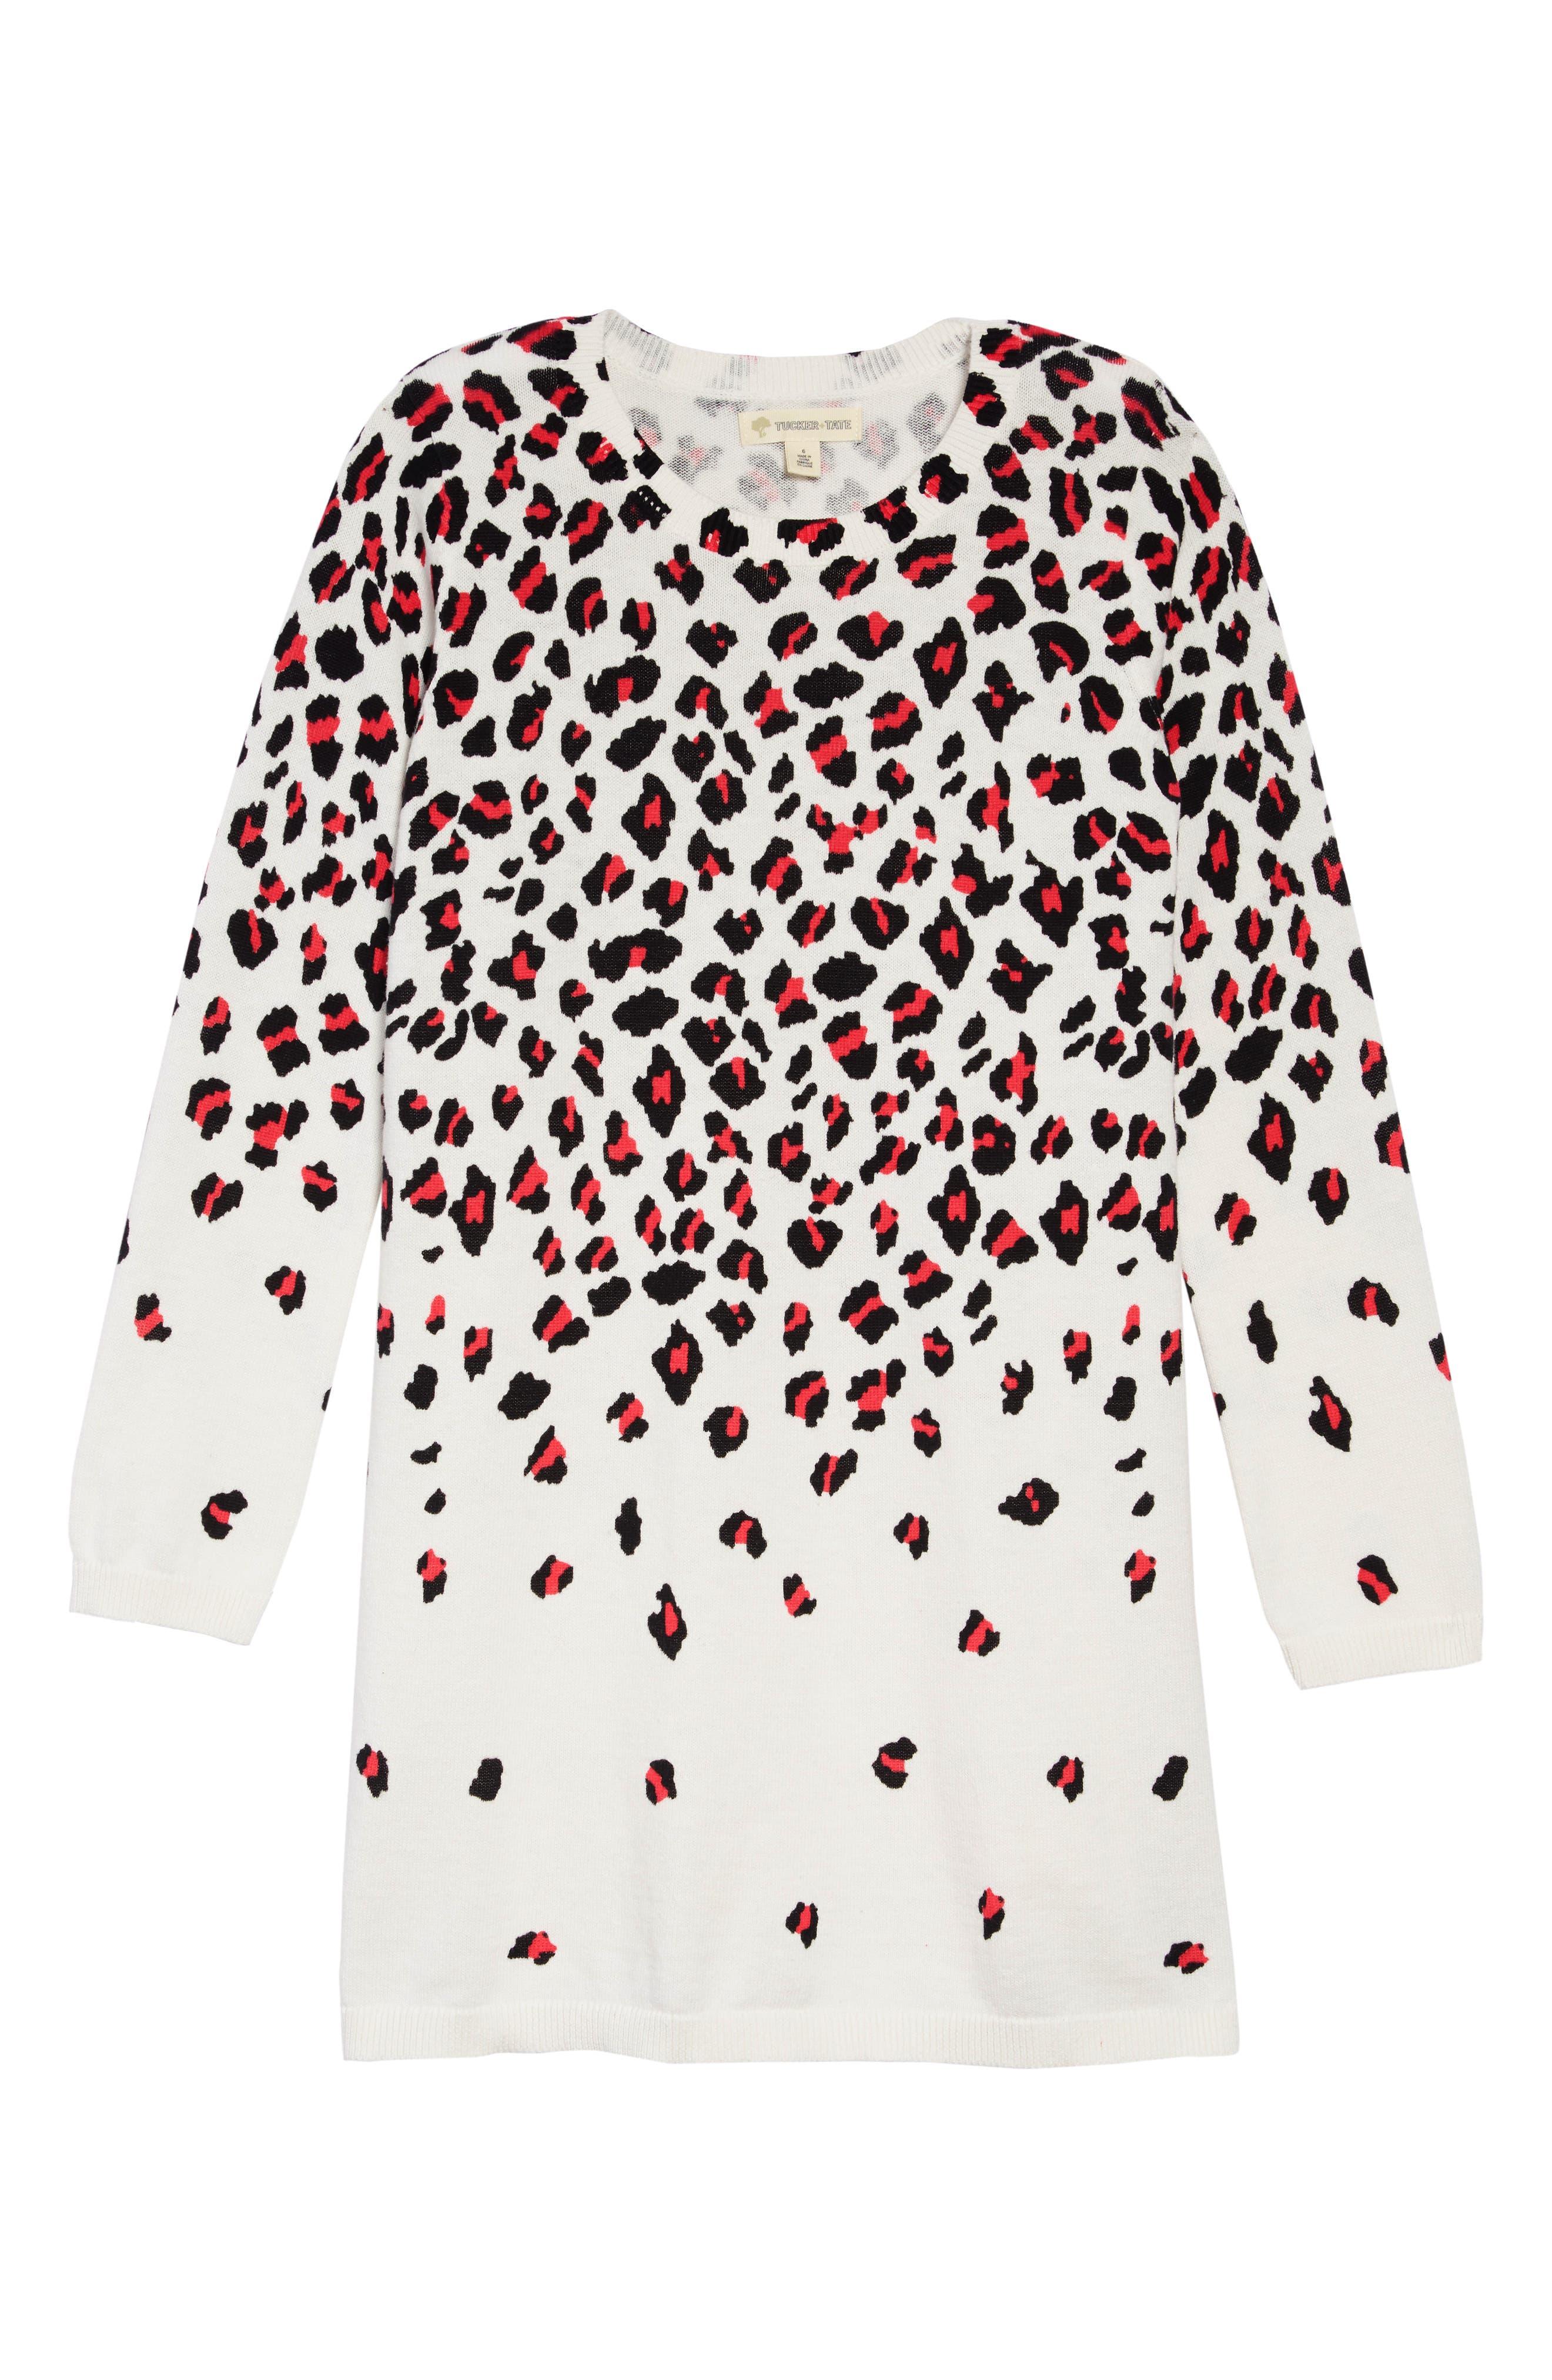 Sweater Dress,                         Main,                         color, IVORY EGRET CHEETAH